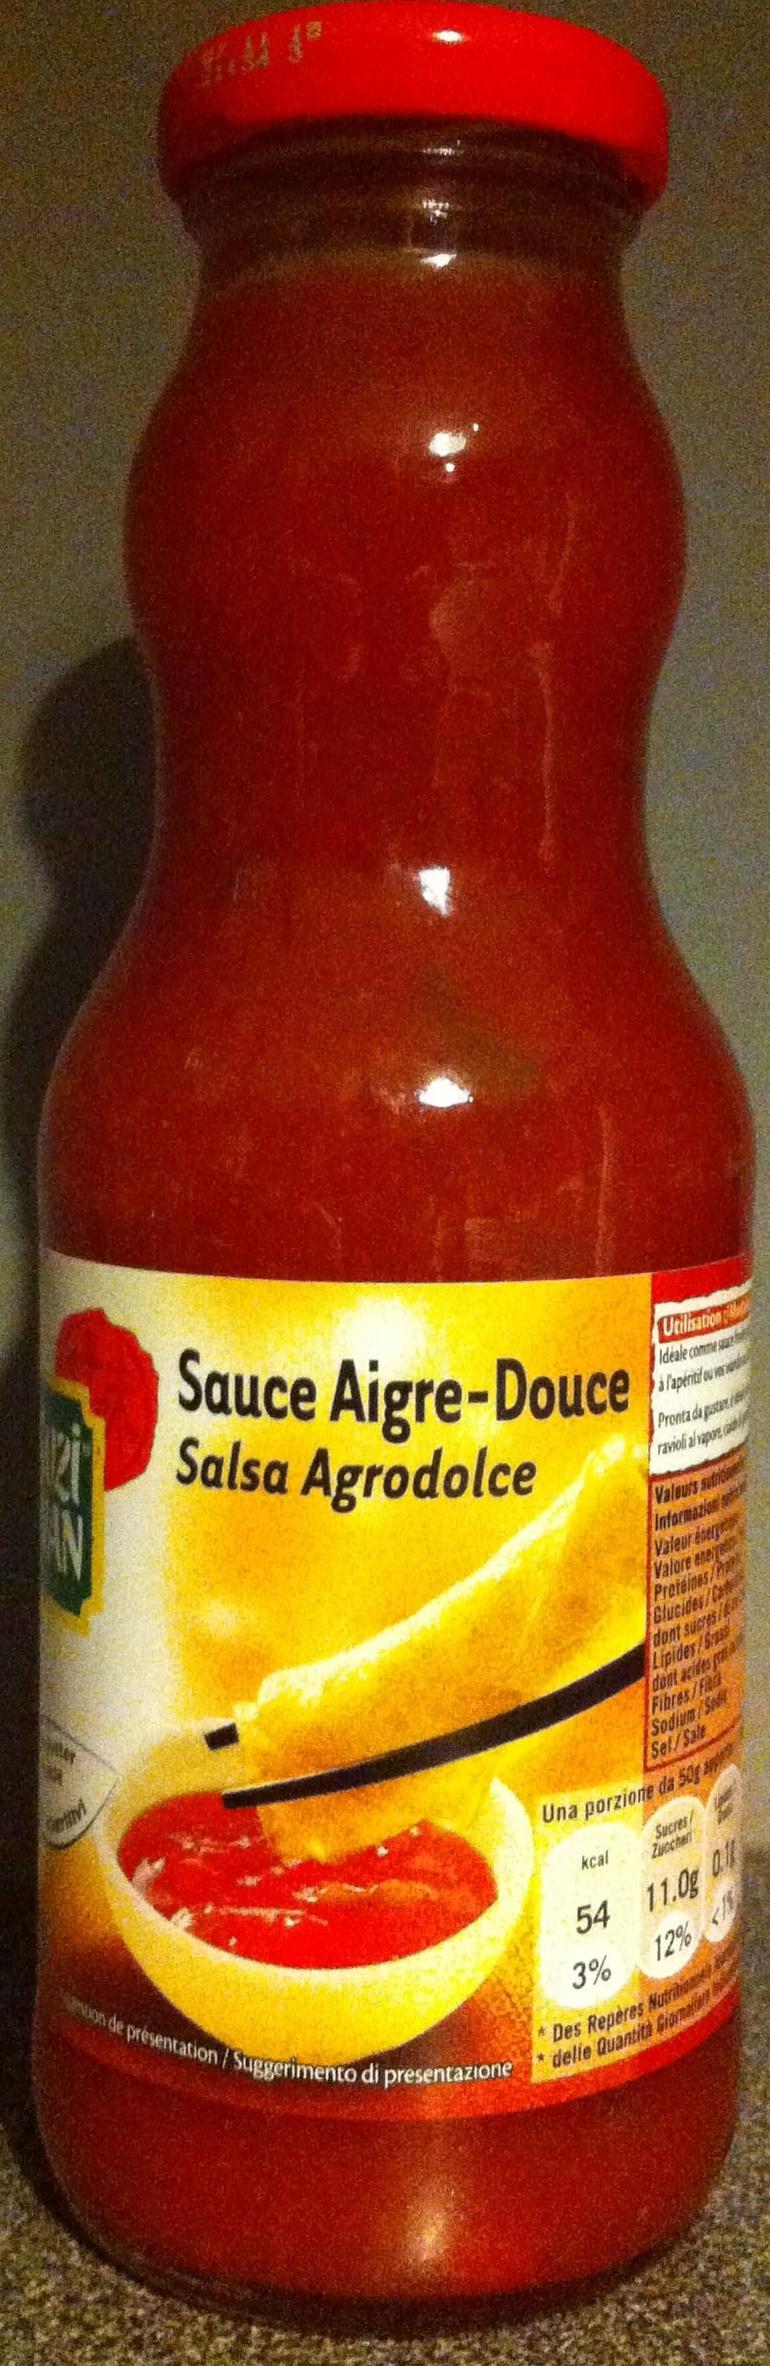 Sauce Aigre douce - Product